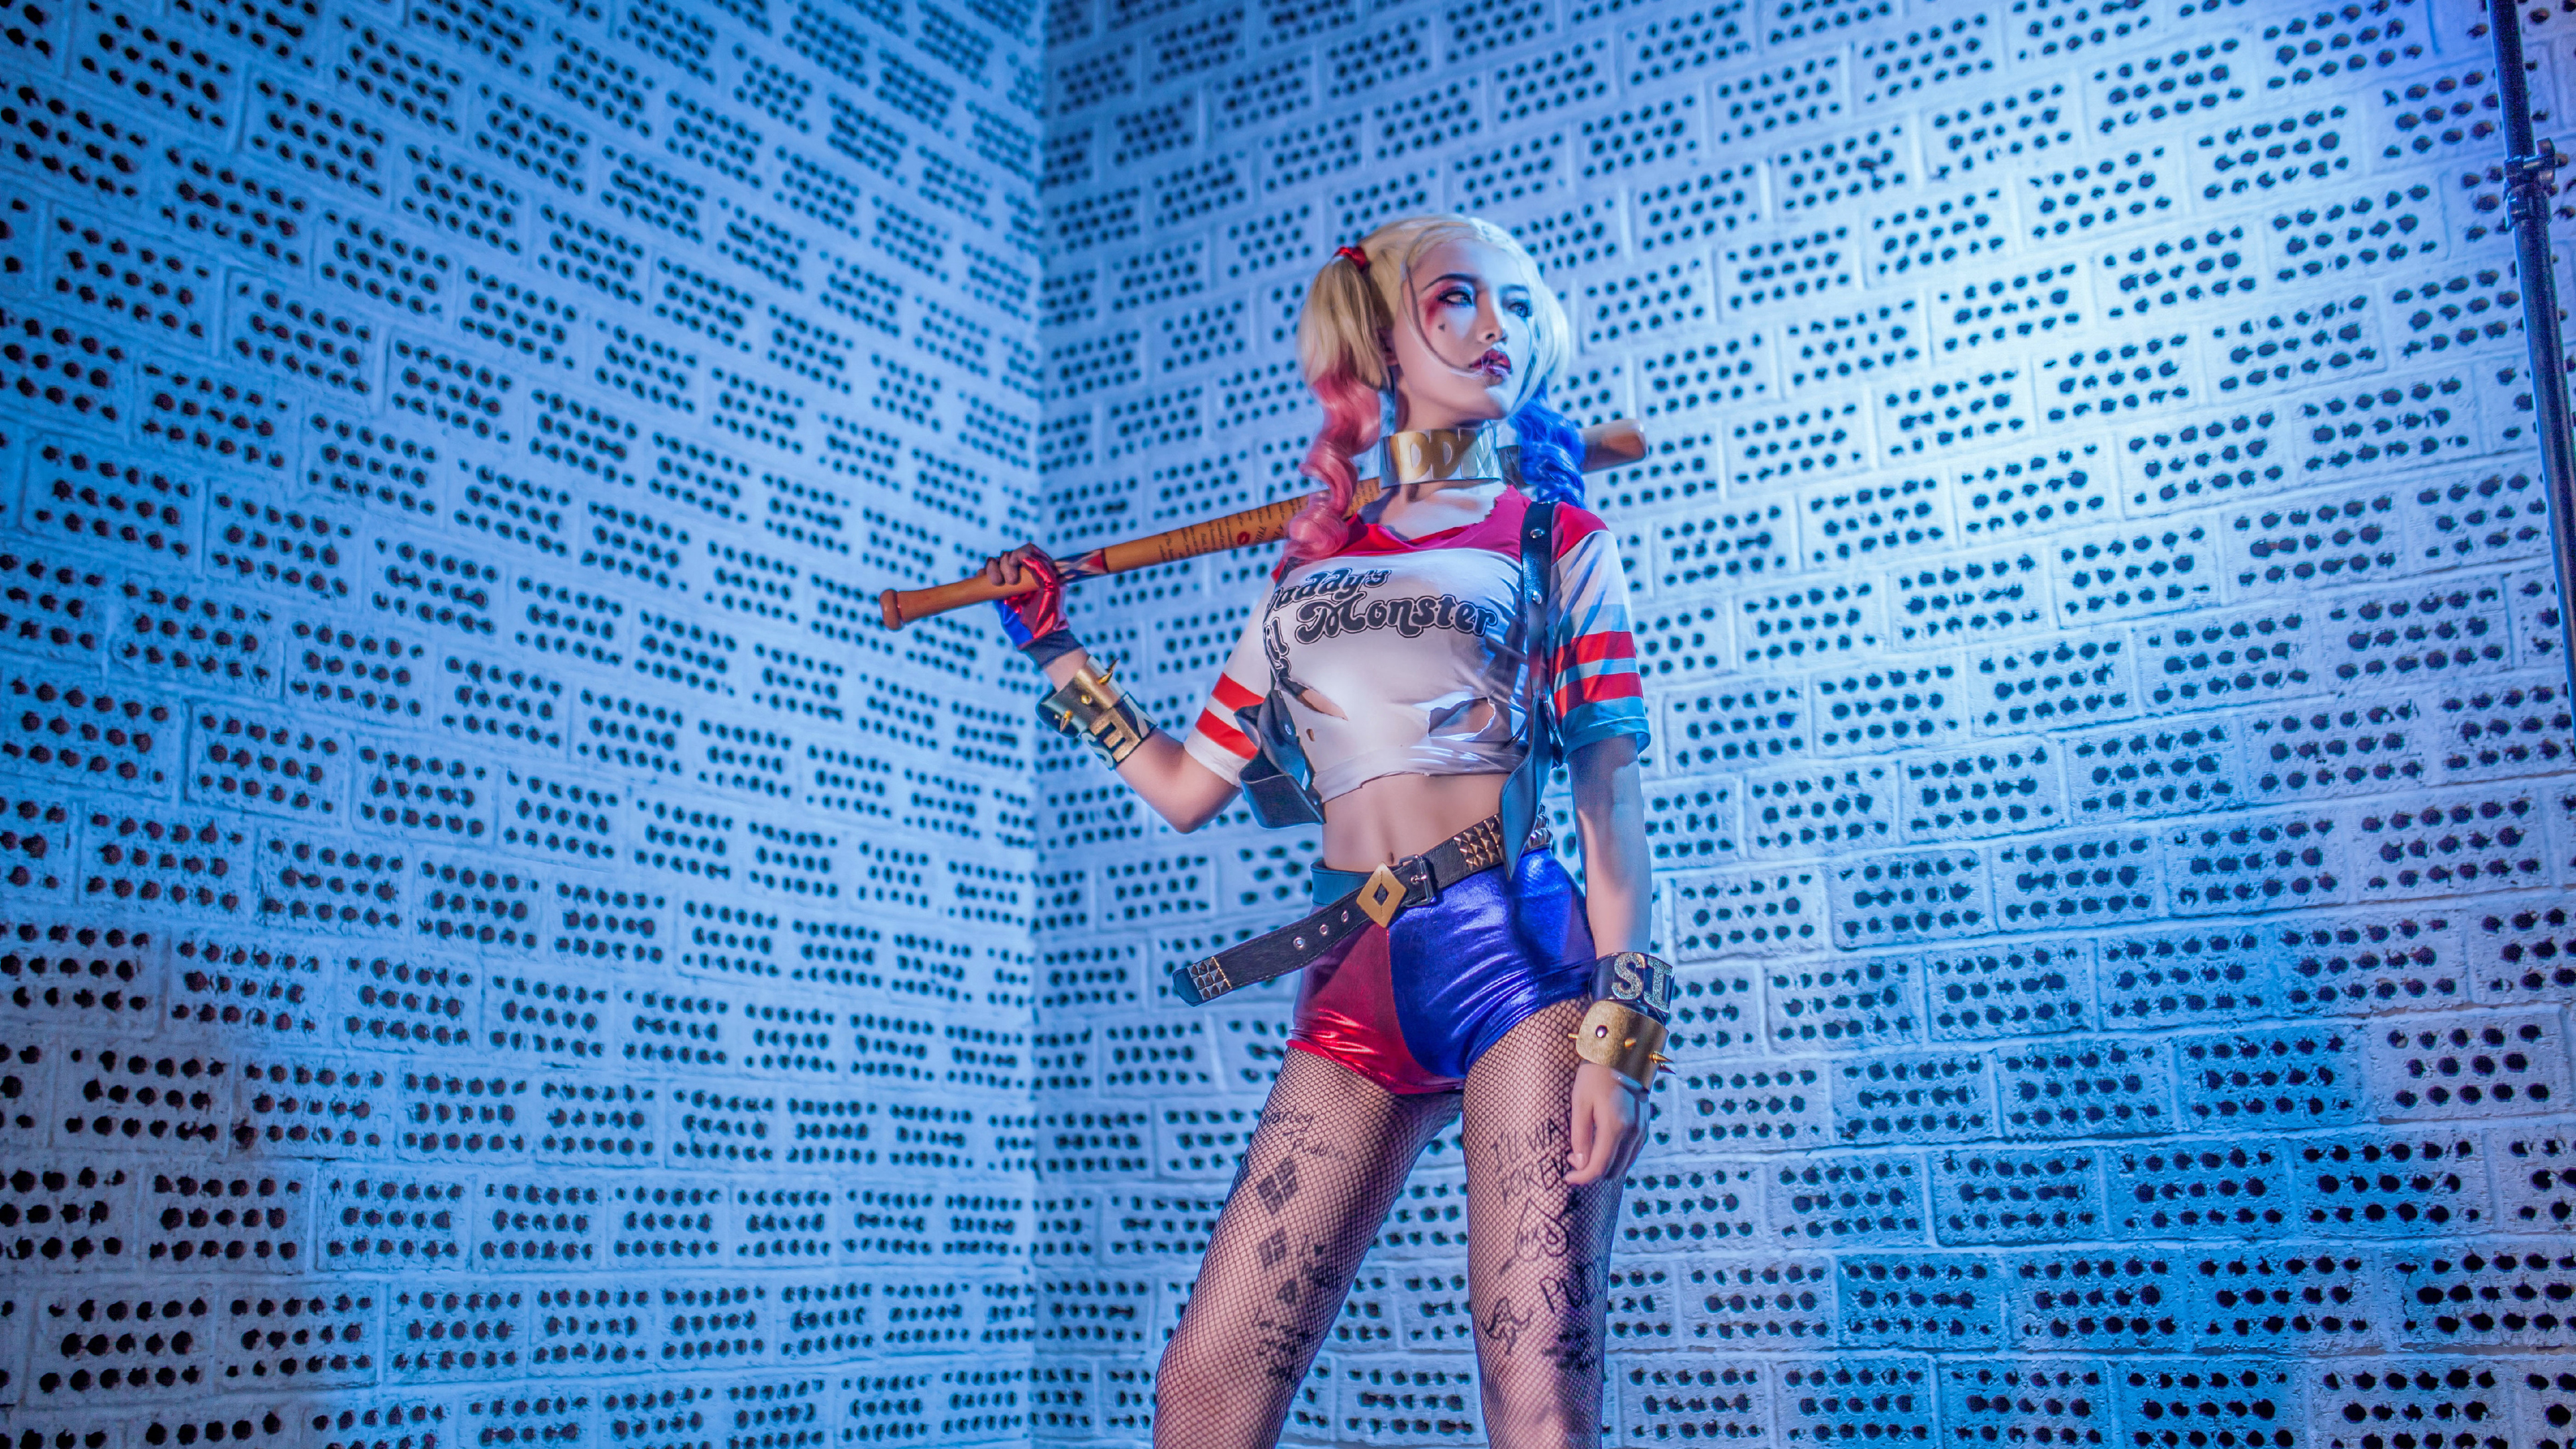 harley quinn cosplay 5k 2018 1539452796 - Harley Quinn Cosplay 5k 2018 - suicide squad wallpapers, hd-wallpapers, harley quinn wallpapers, cosplay wallpapers, 5k wallpapers, 4k-wallpapers